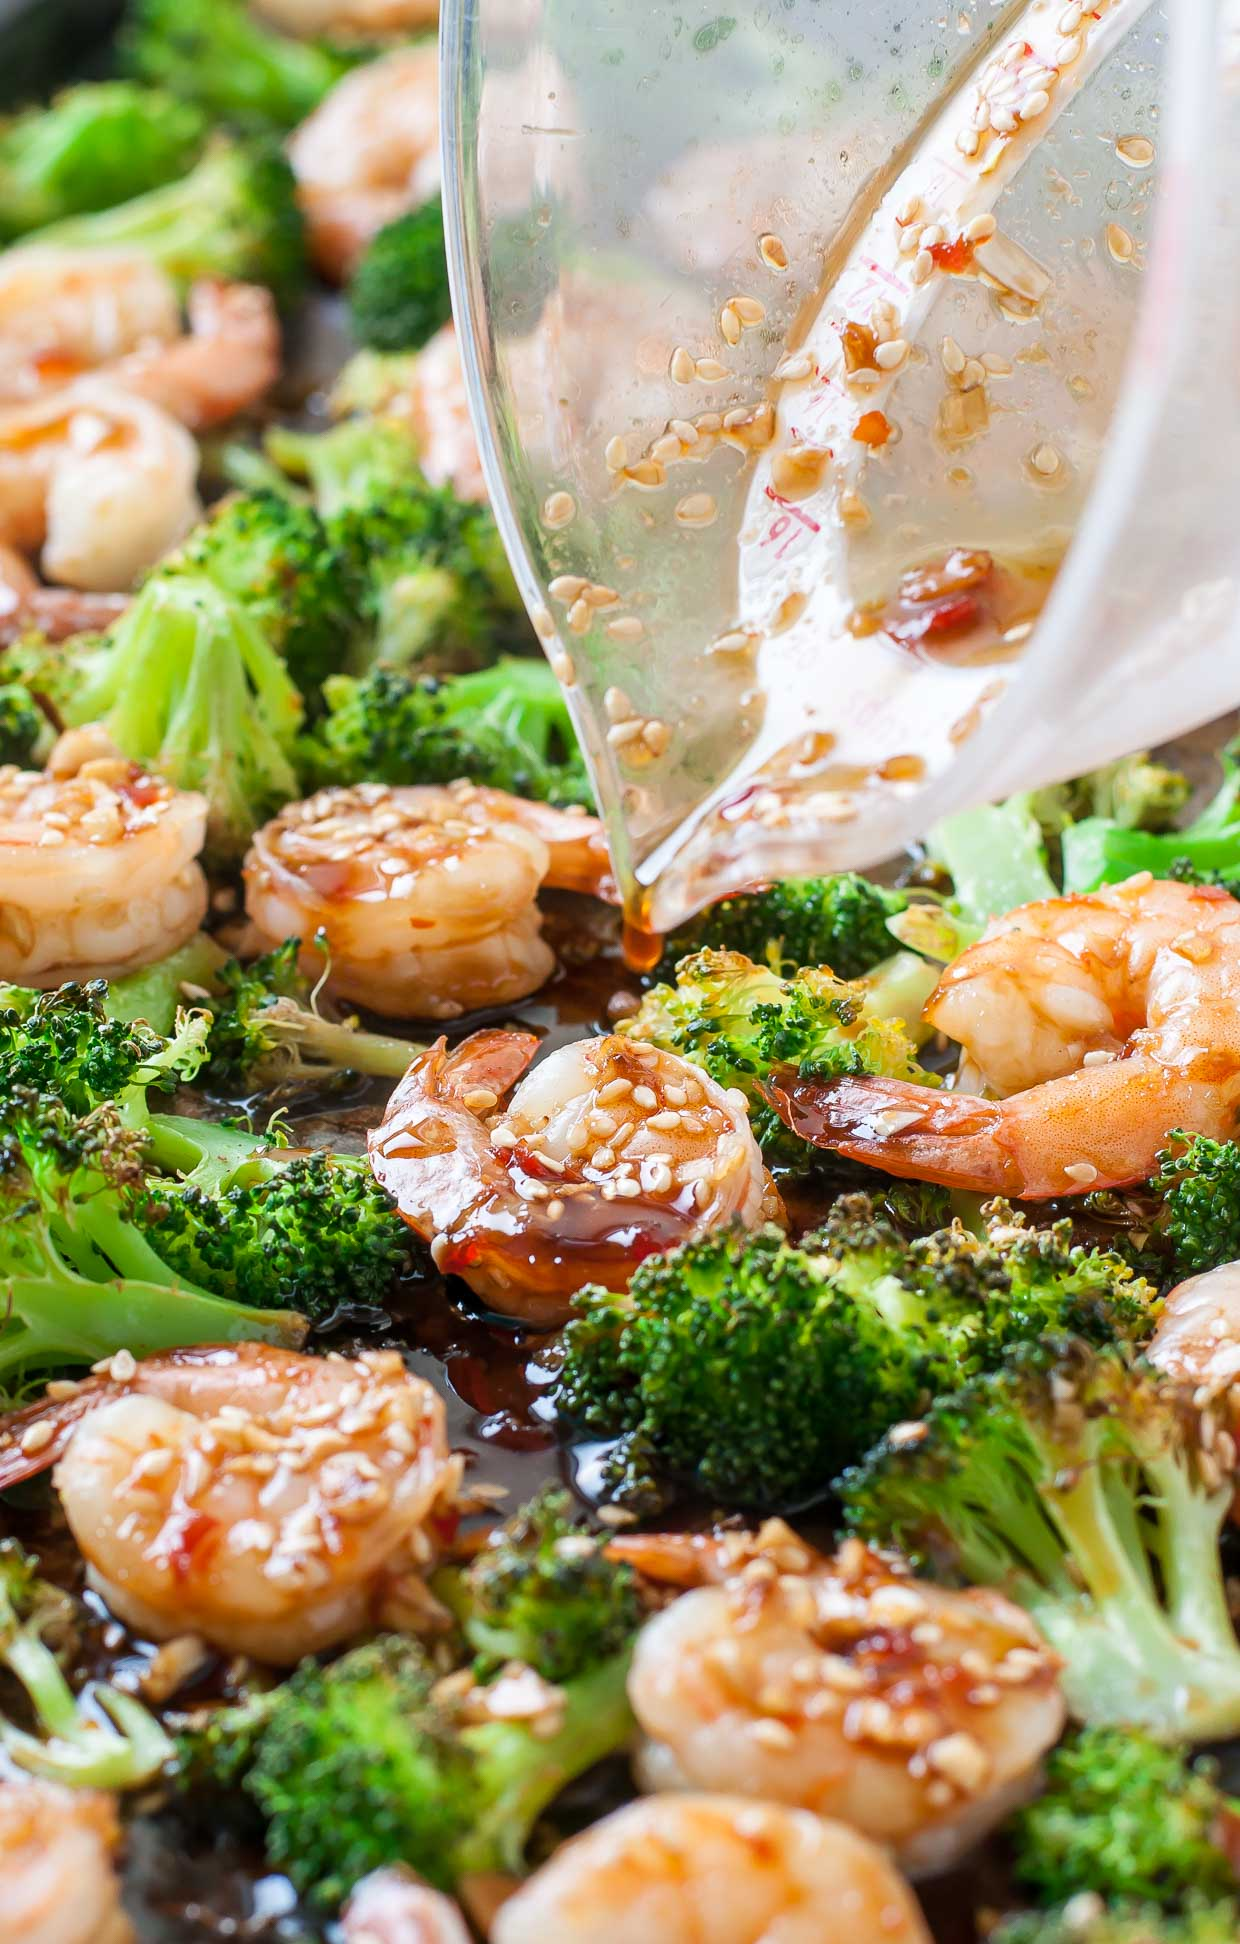 Sheet Pan Roasted Honey Garlic Shrimp and Broccoli -- LOVE this easy recipe!